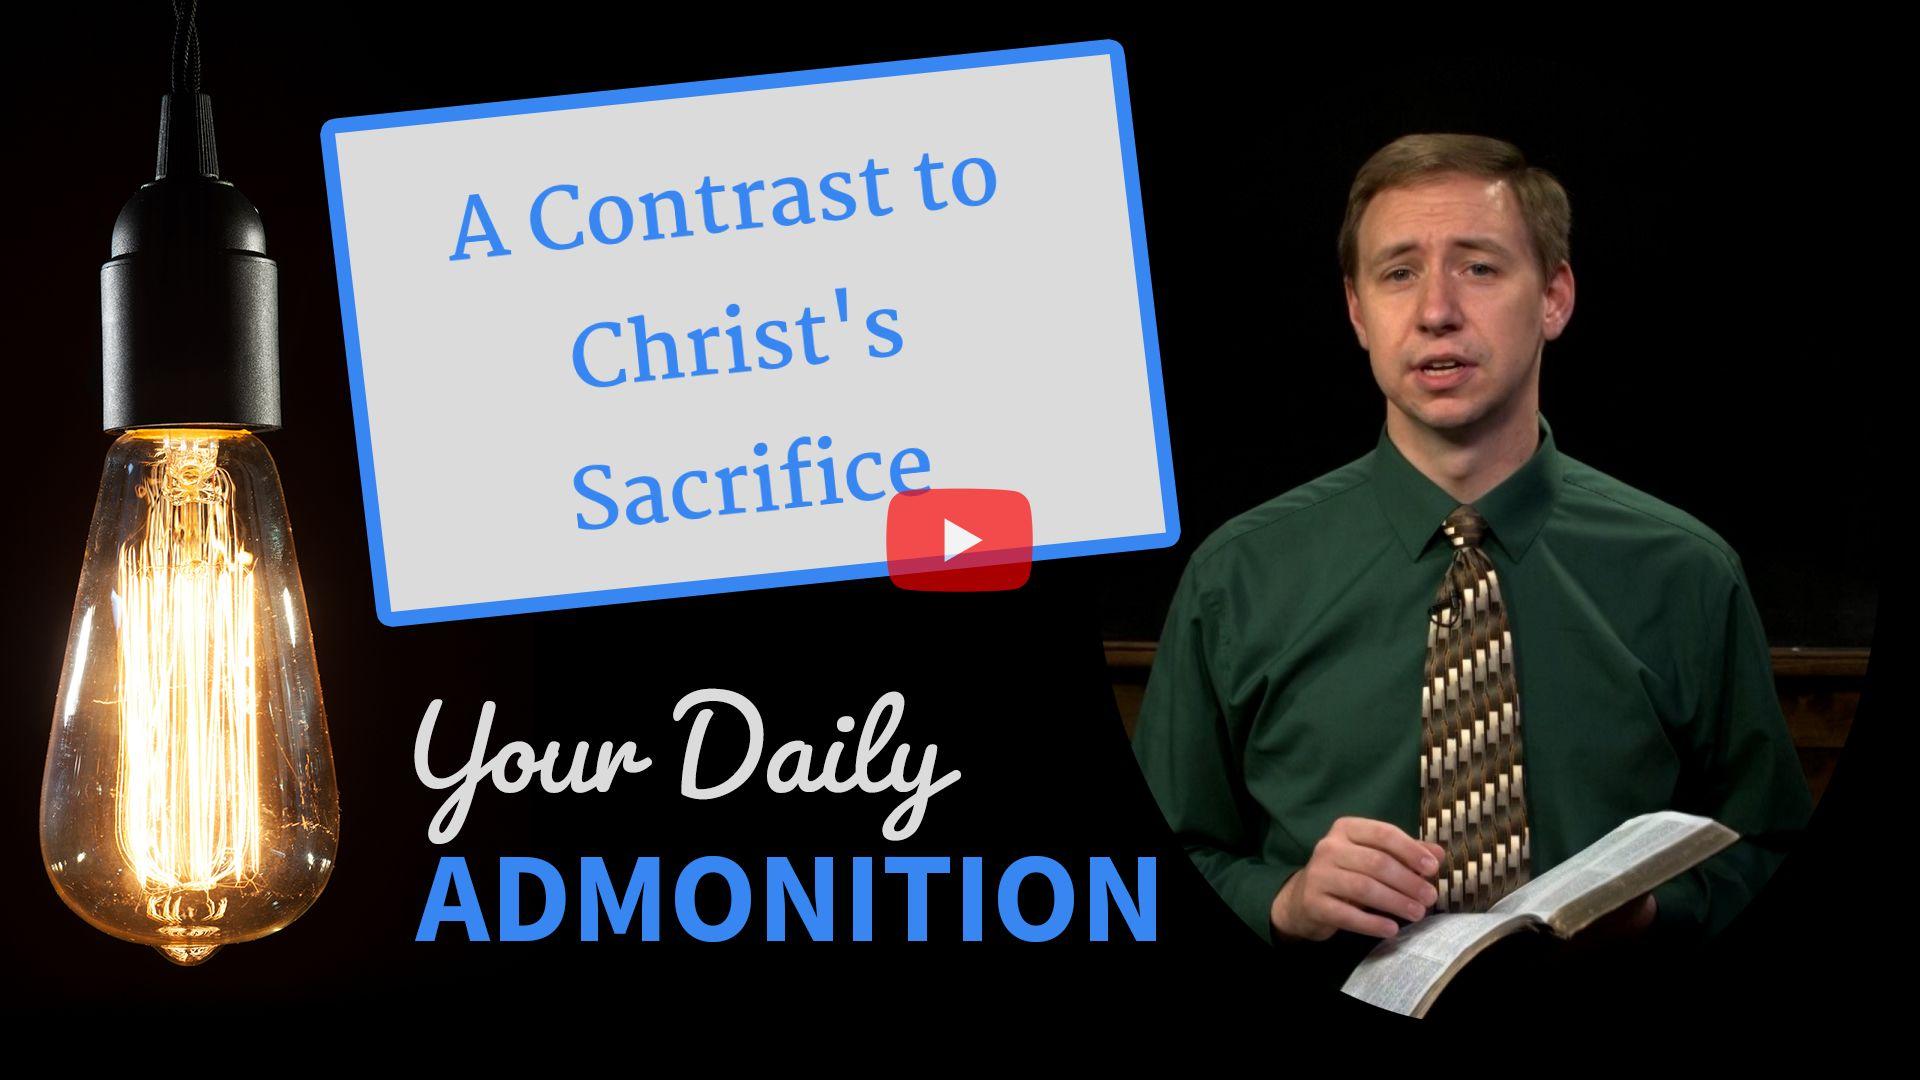 A Contrast to Christ's Sacrifice